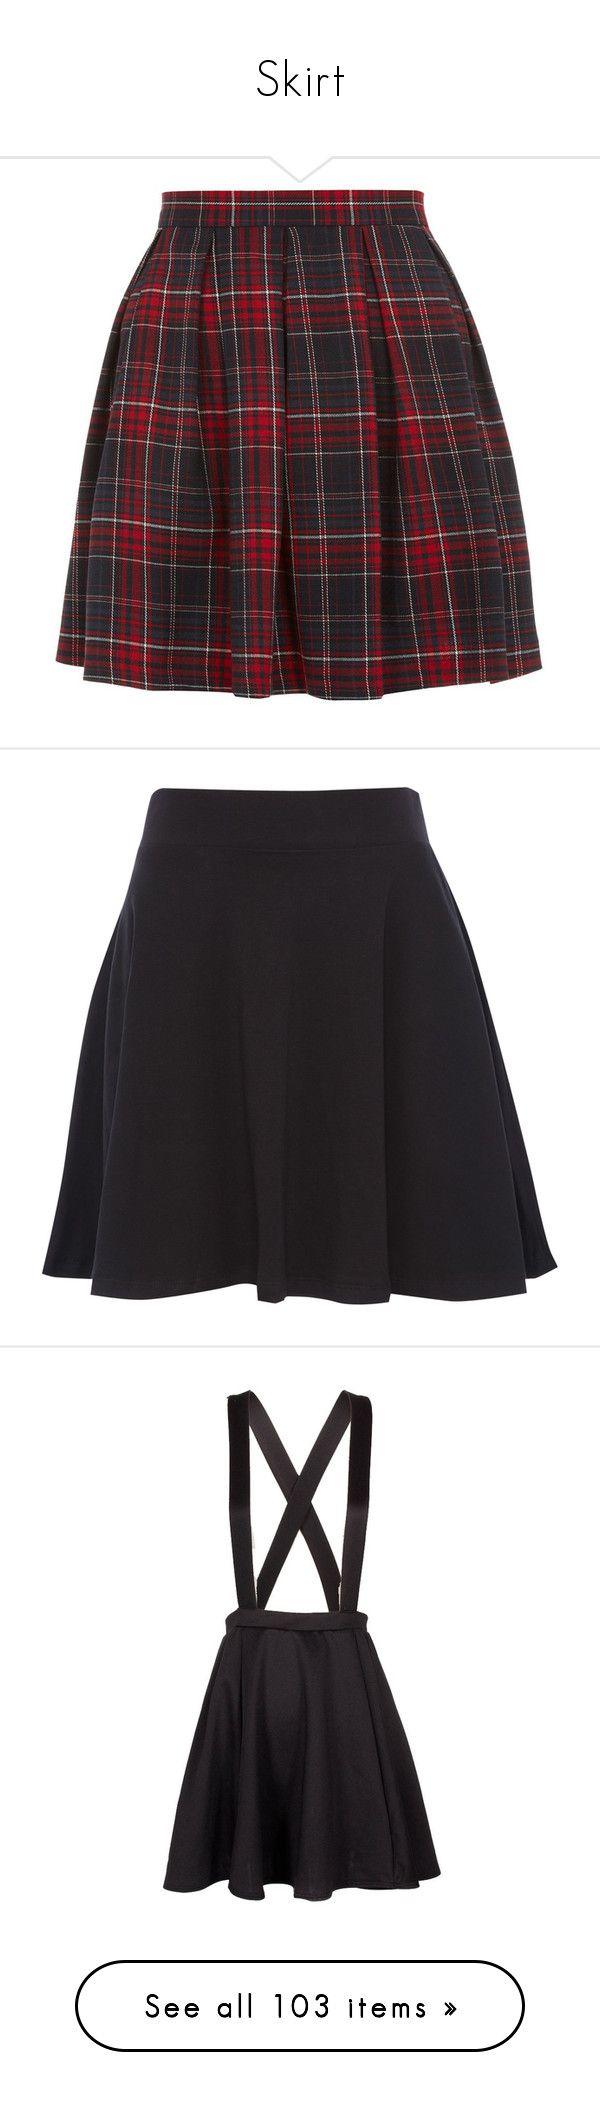 """Skirt"" by the-blueglasses ❤ liked on Polyvore featuring skirts, bottoms, saias, faldas, red knee length skirt, patterned skater skirt, red circle skirt, flared skirt, skater skirts and black"